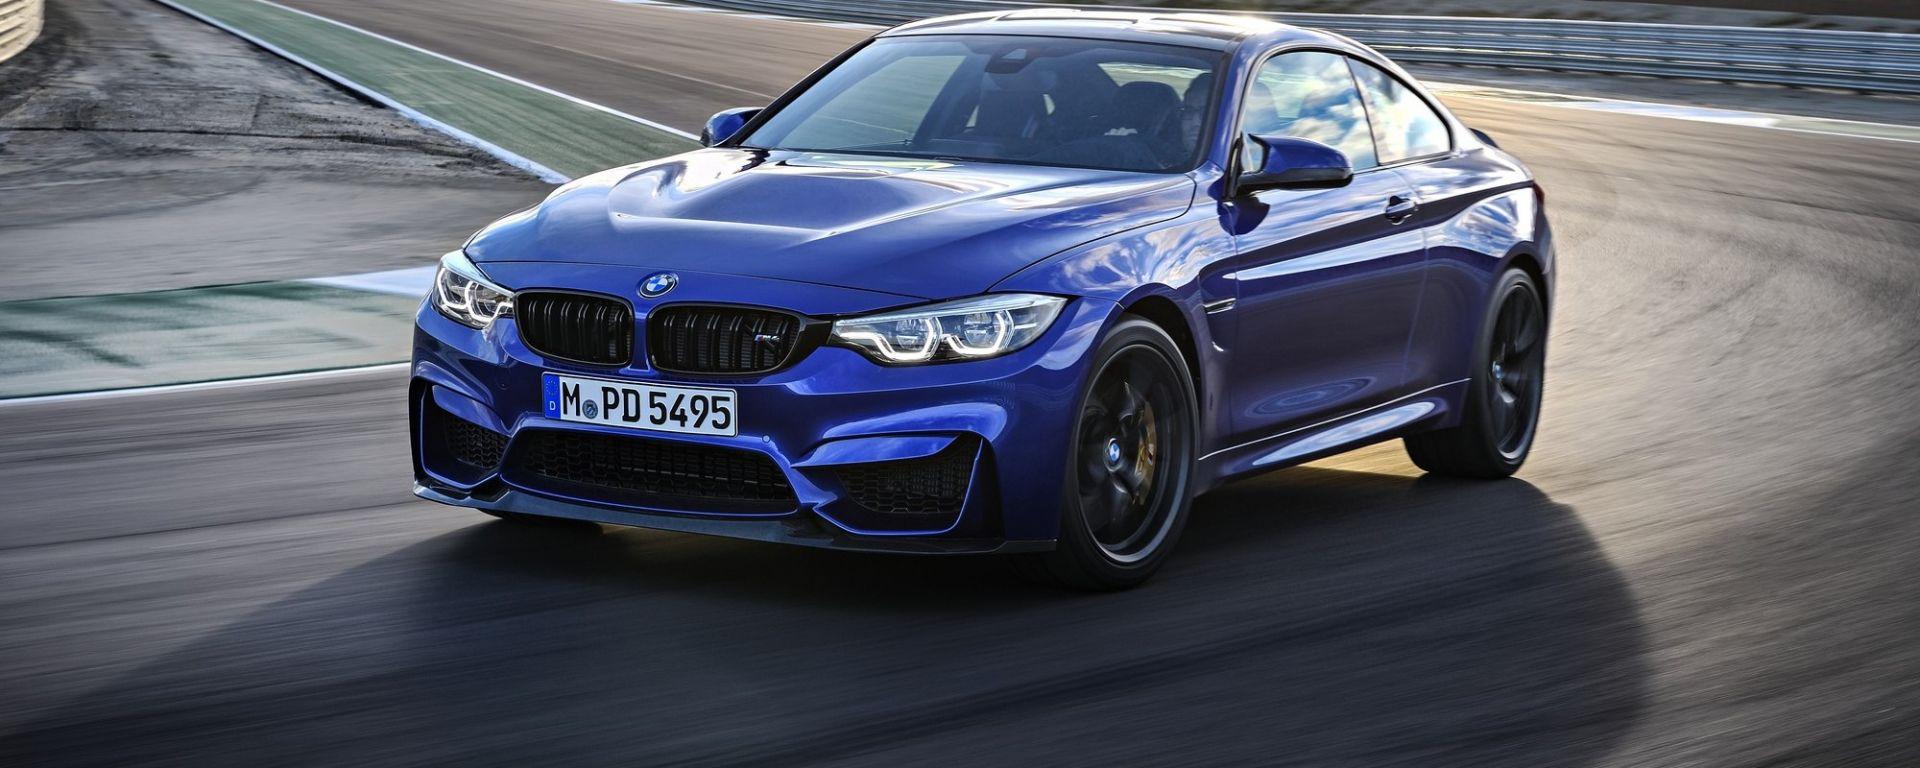 BMW M4 CS: più di una Competition, meno di una GTS